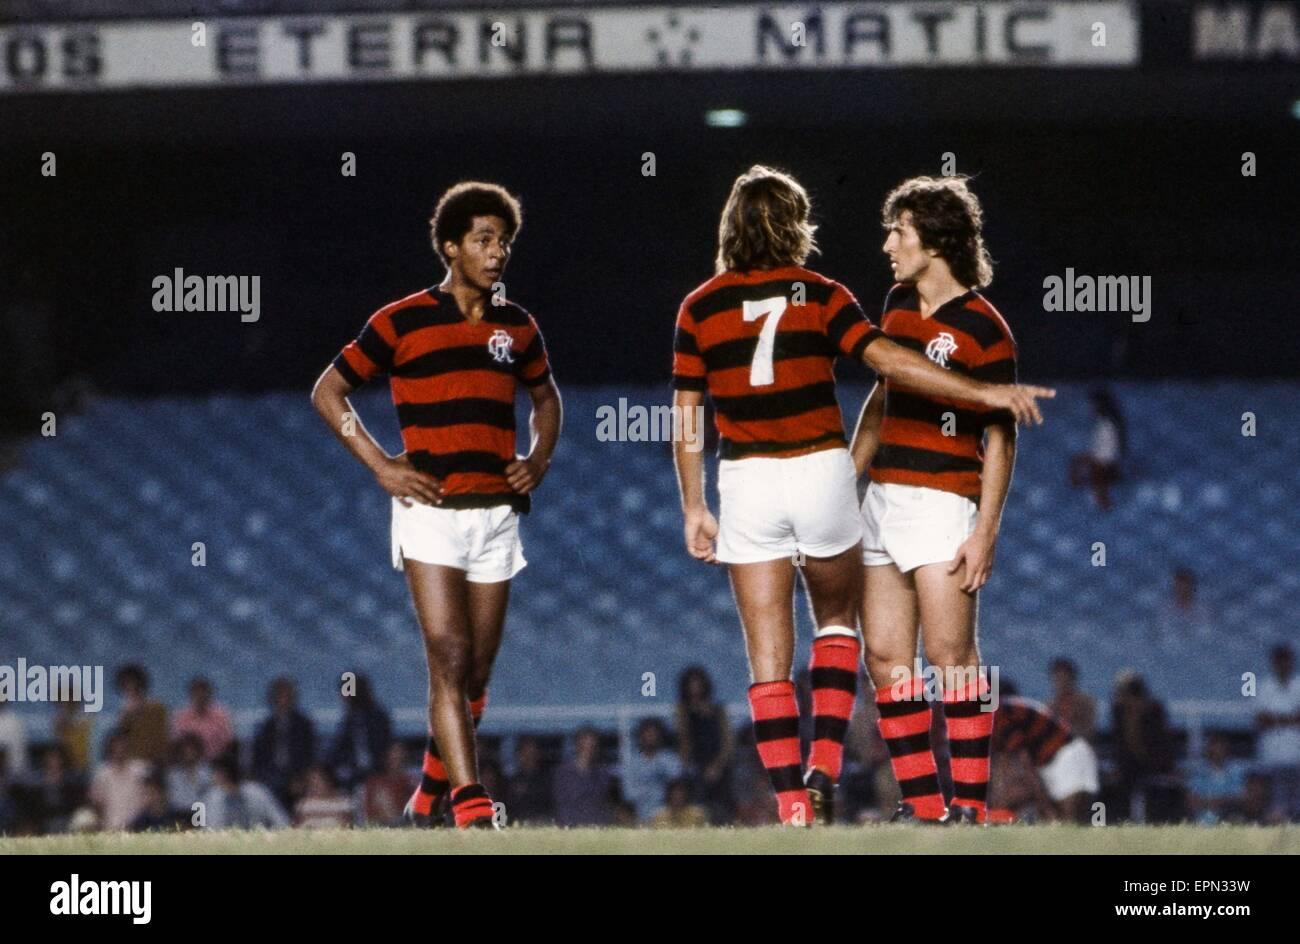 Geraldo Assoviador/Narciso Horacio Doval/Zico - 19.05.1975 - Flamengo - Championnat du Bresil-.Photo : PPG/Icon - Stock Image